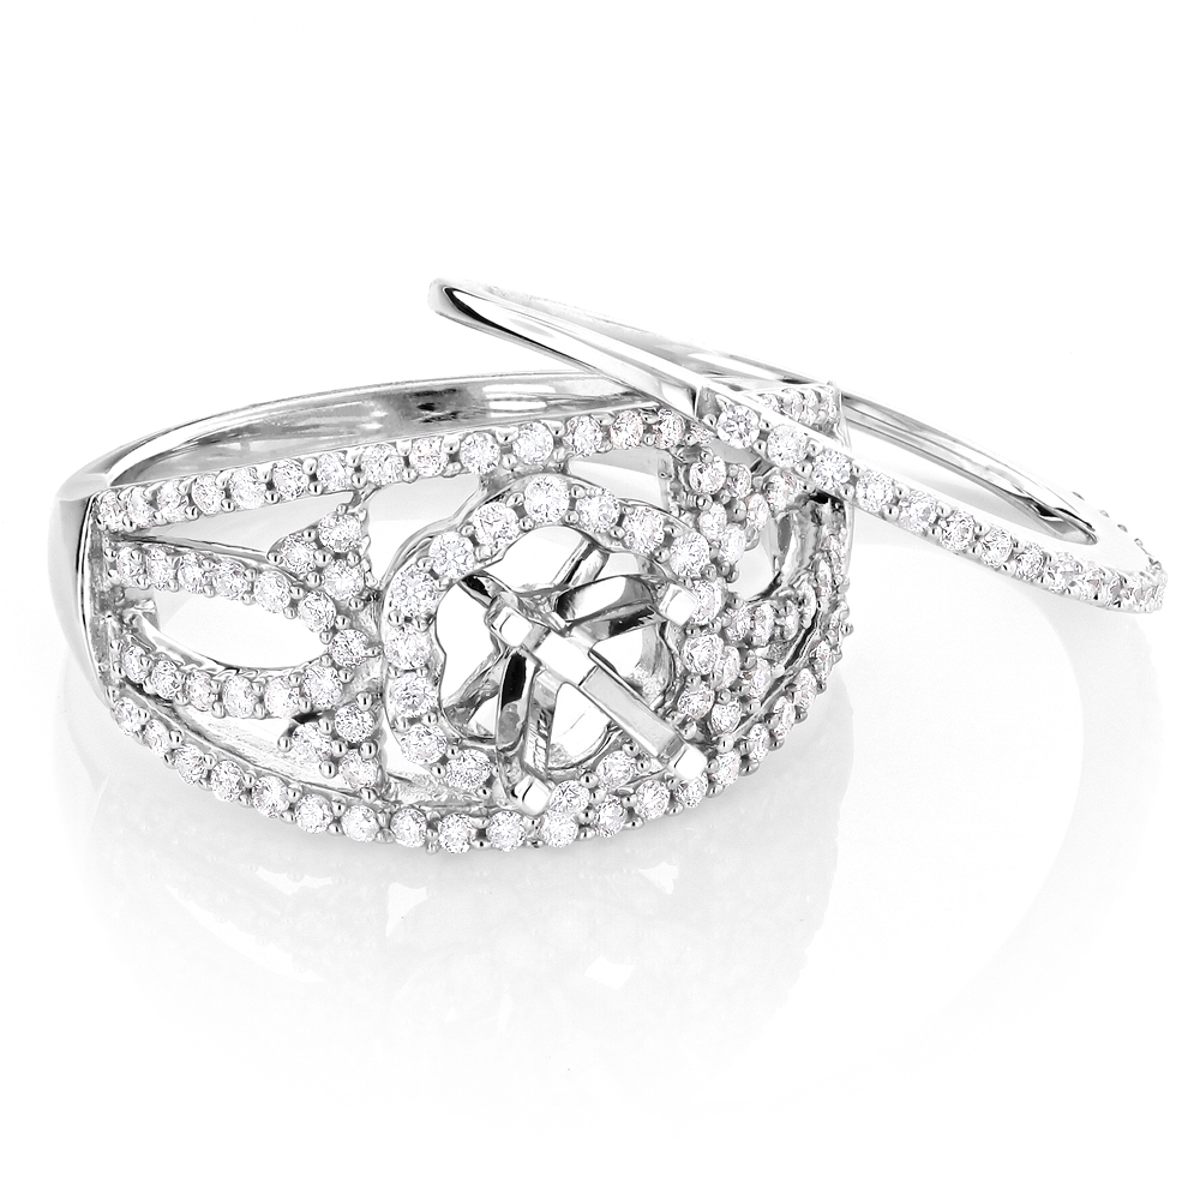 14K Gold Diamond Engagement Ring Set 0.85ct